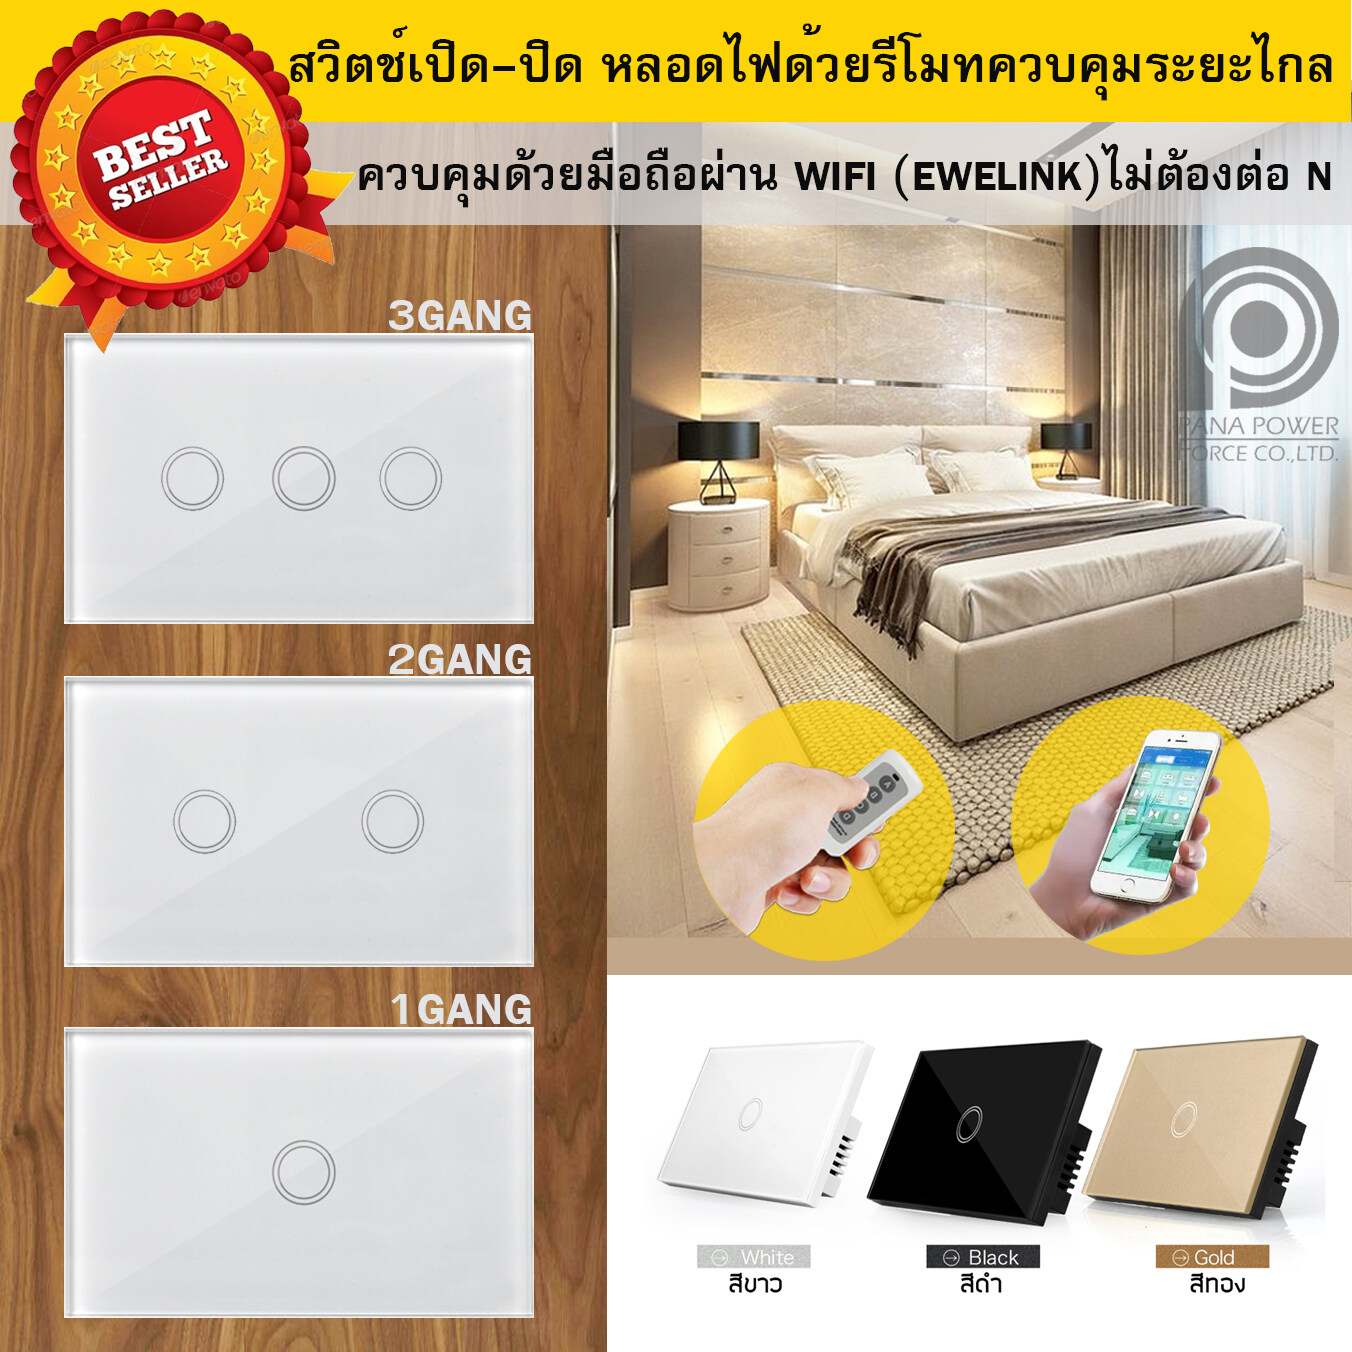 Mobile Phone Wifi & Remote Control Touch Switch 1/2/3 Gang สวิตช์เปิด-ปิดหลอดไฟแบบสัมผัส(1/2/3Gang) พร้อมรีโมทและควบคุมระยะไกลผ่านมือถือได้